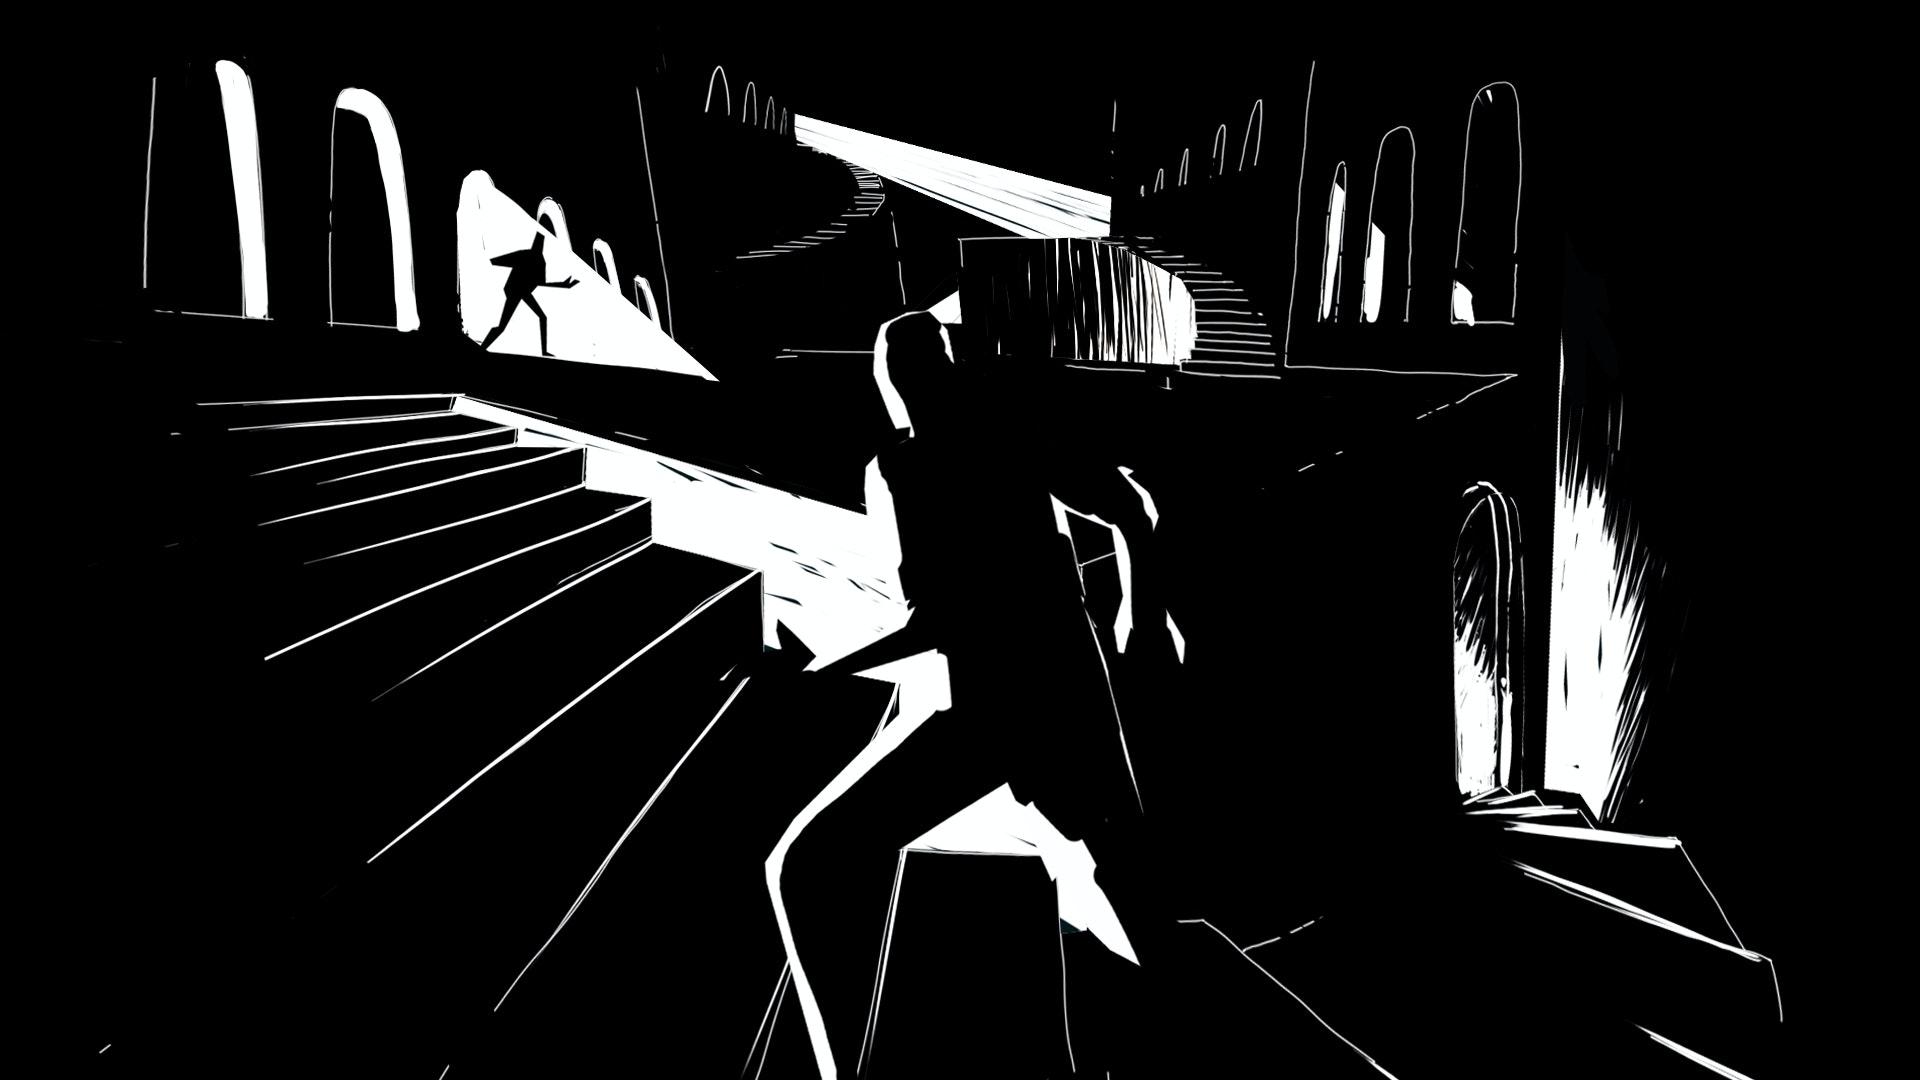 Black and white concept illustration